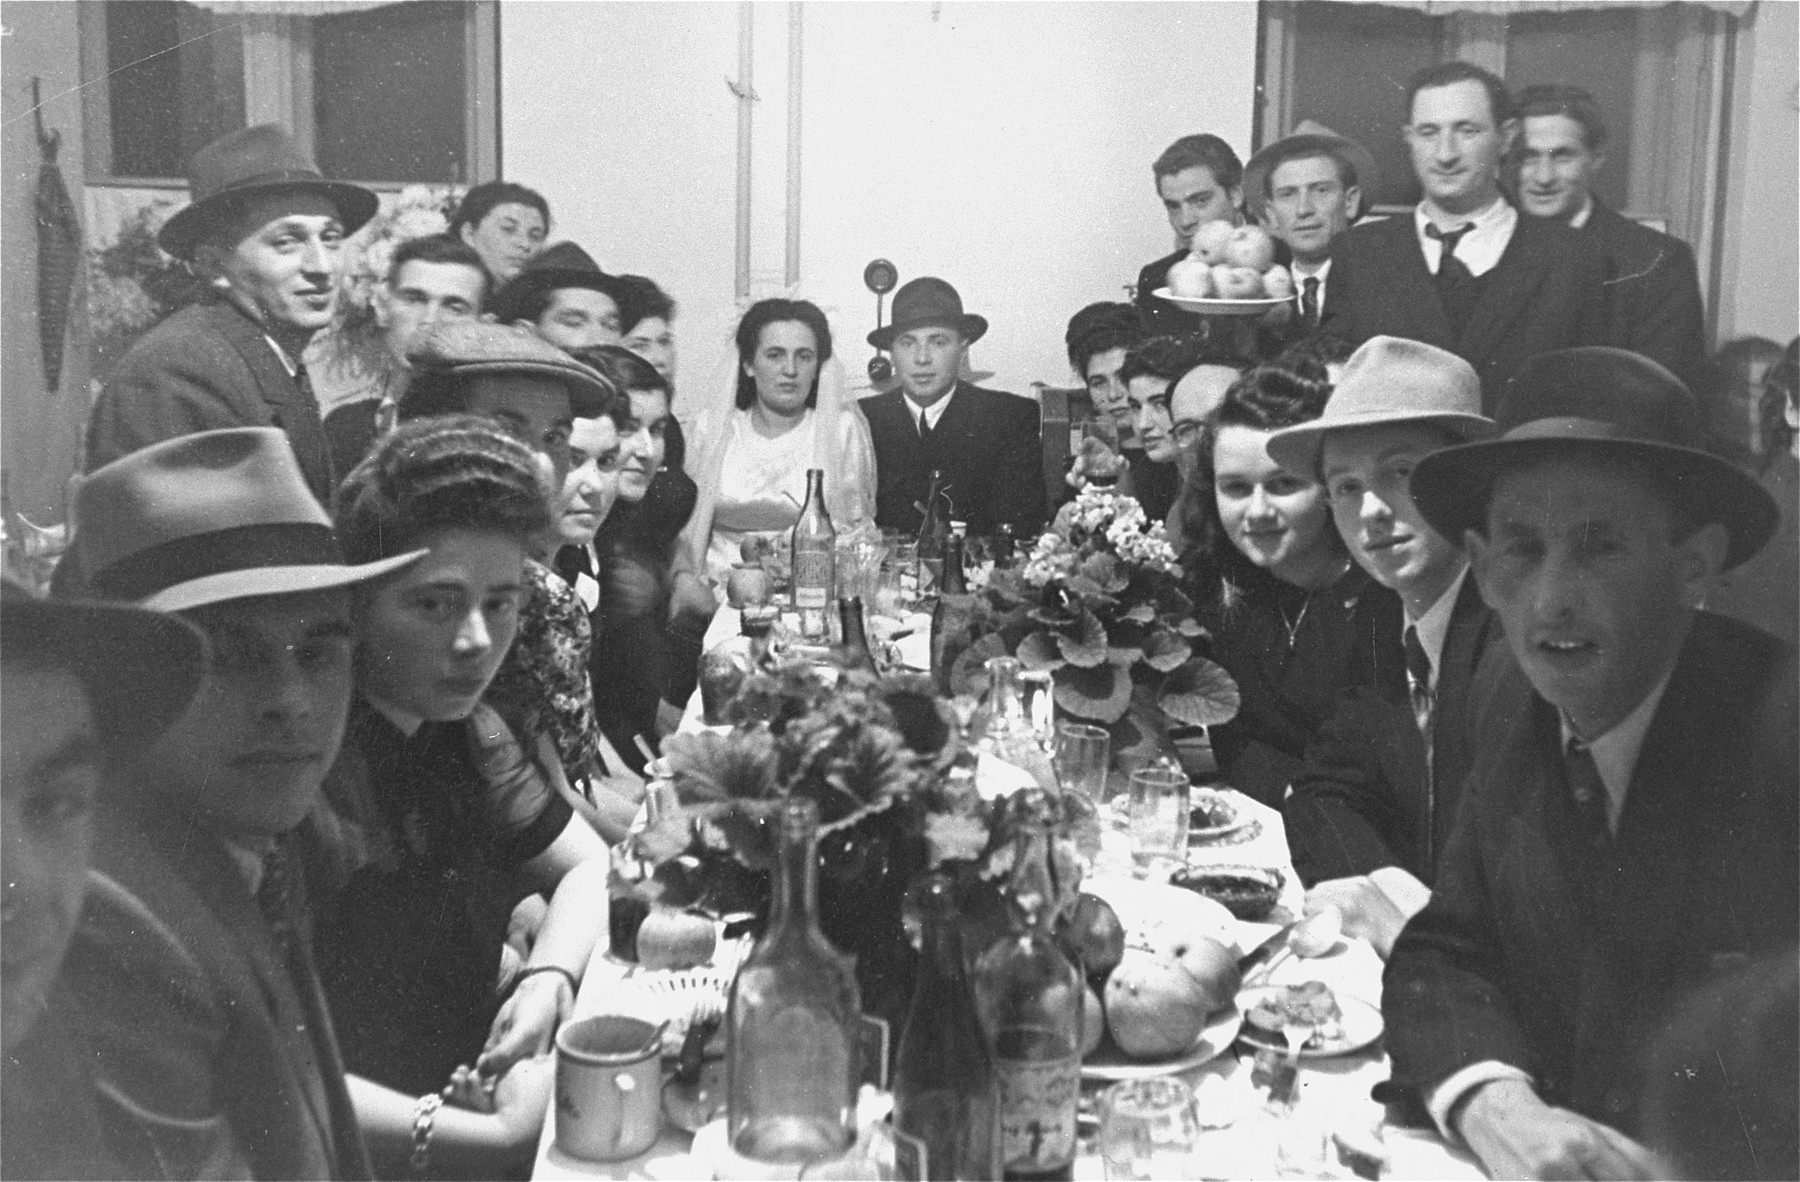 A Jewish wedding celebration in the Ebelsberg DP camp in Linz, Austria.